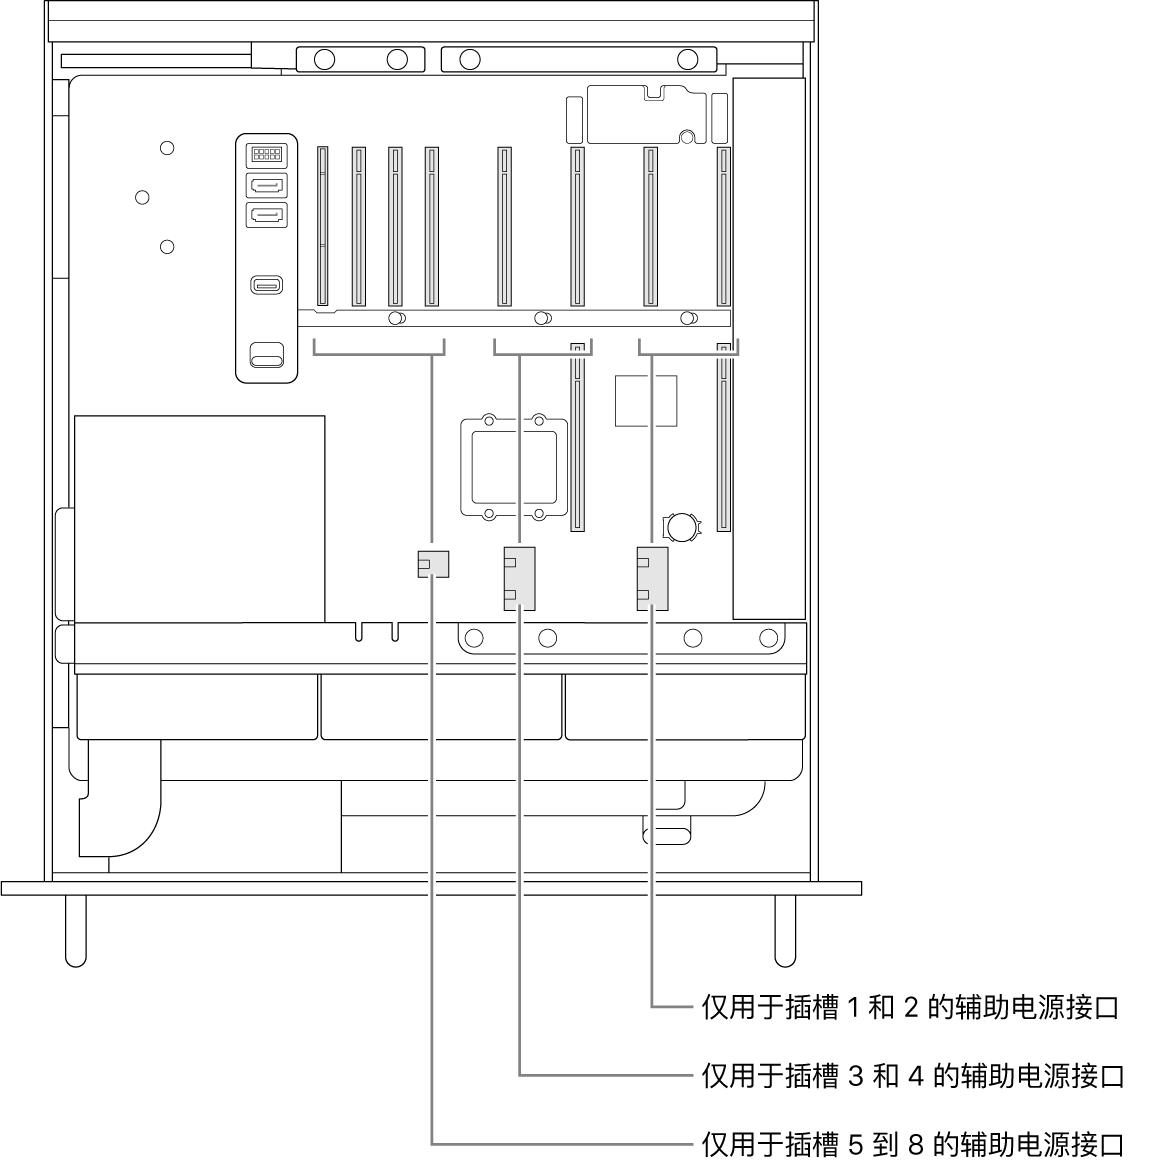 MacPro 的一侧打开,标注显示与各插槽对应的辅助电源接头。